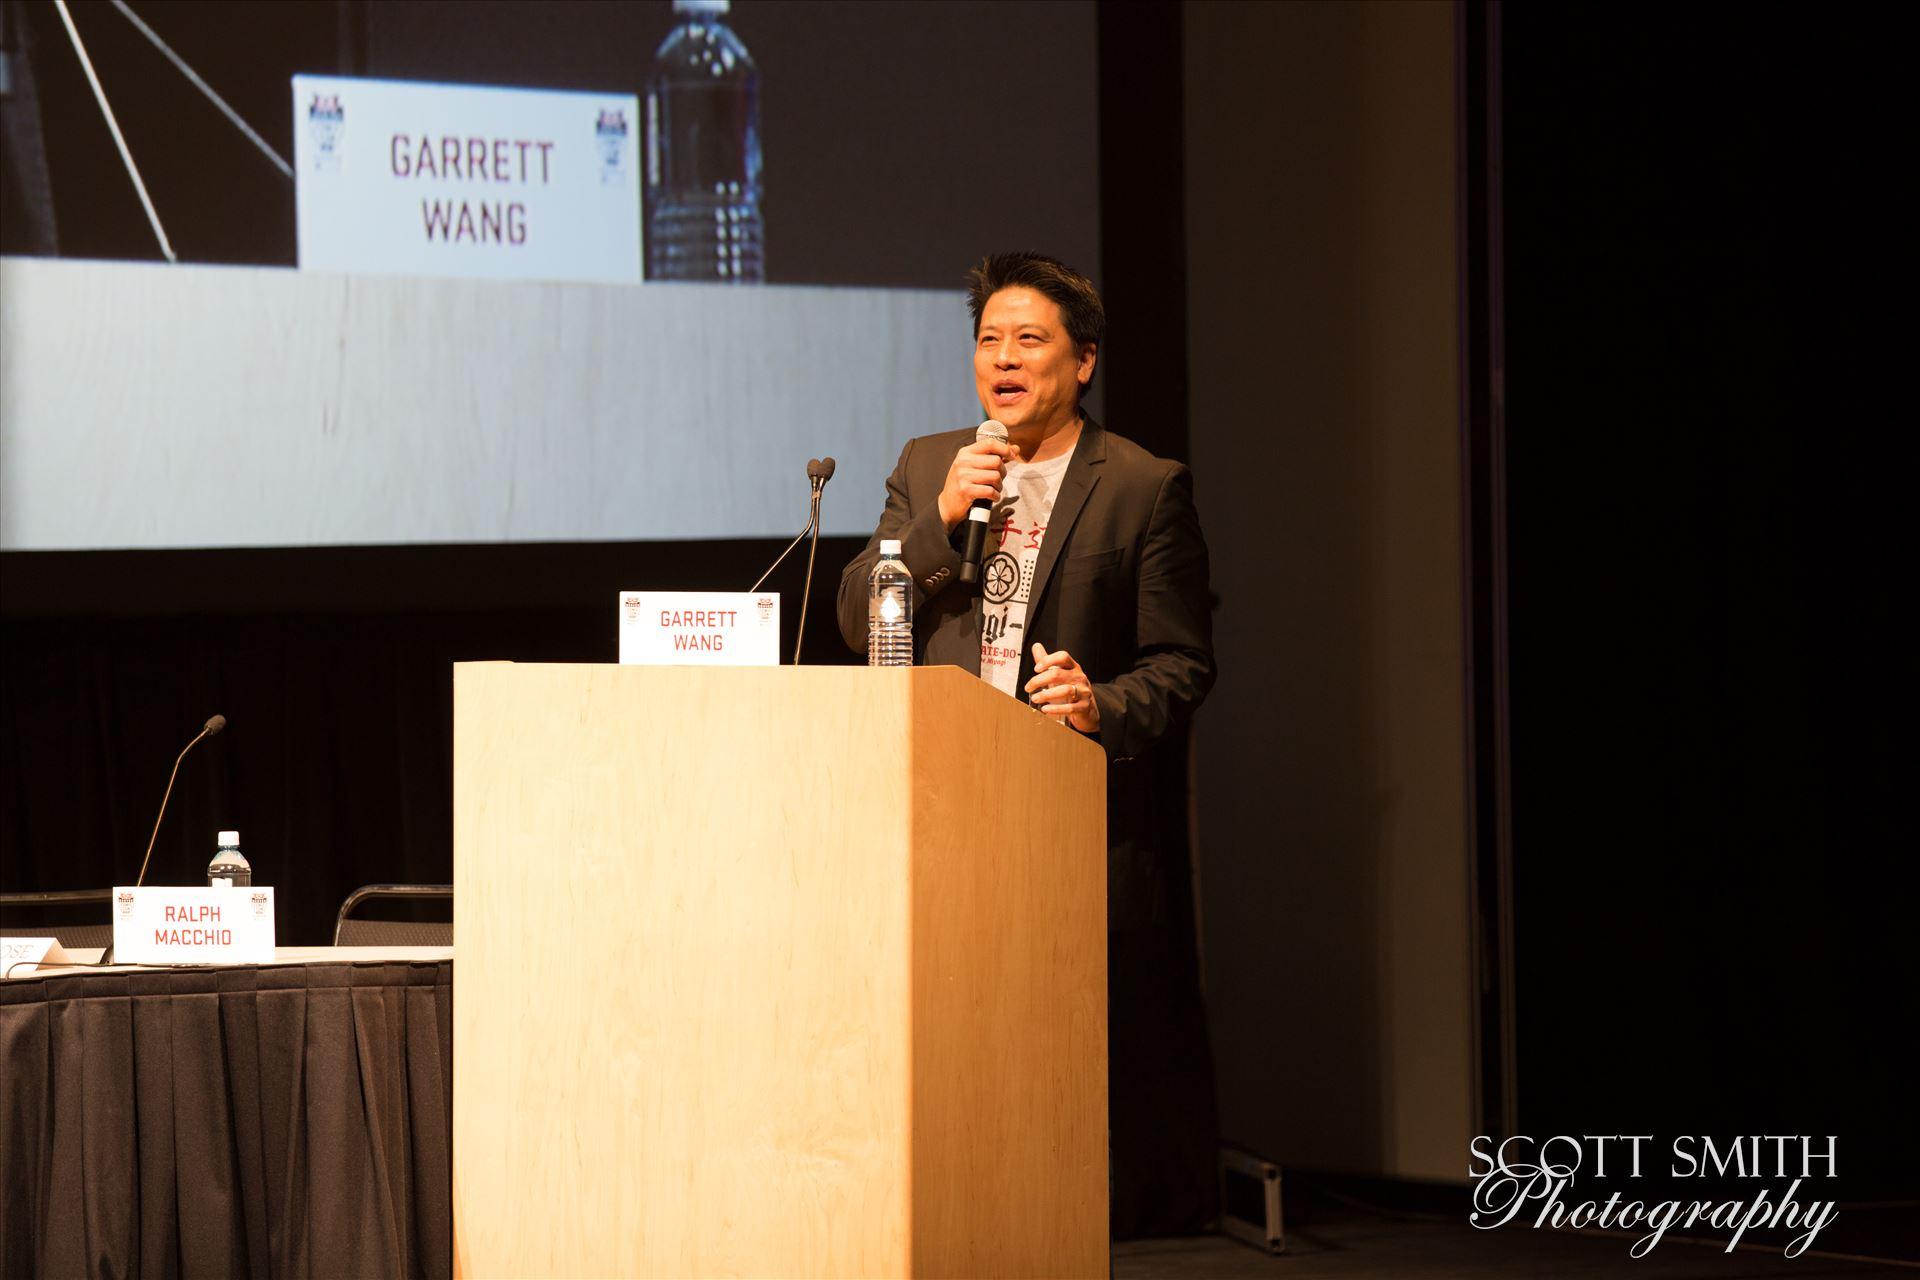 Denver Comic Con 2016 33 - Denver Comic Con 2016 at the Colorado Convention Center. Garrett Wang, Ralph Macchio, Martin Kove and William Zabka. by D Scott Smith